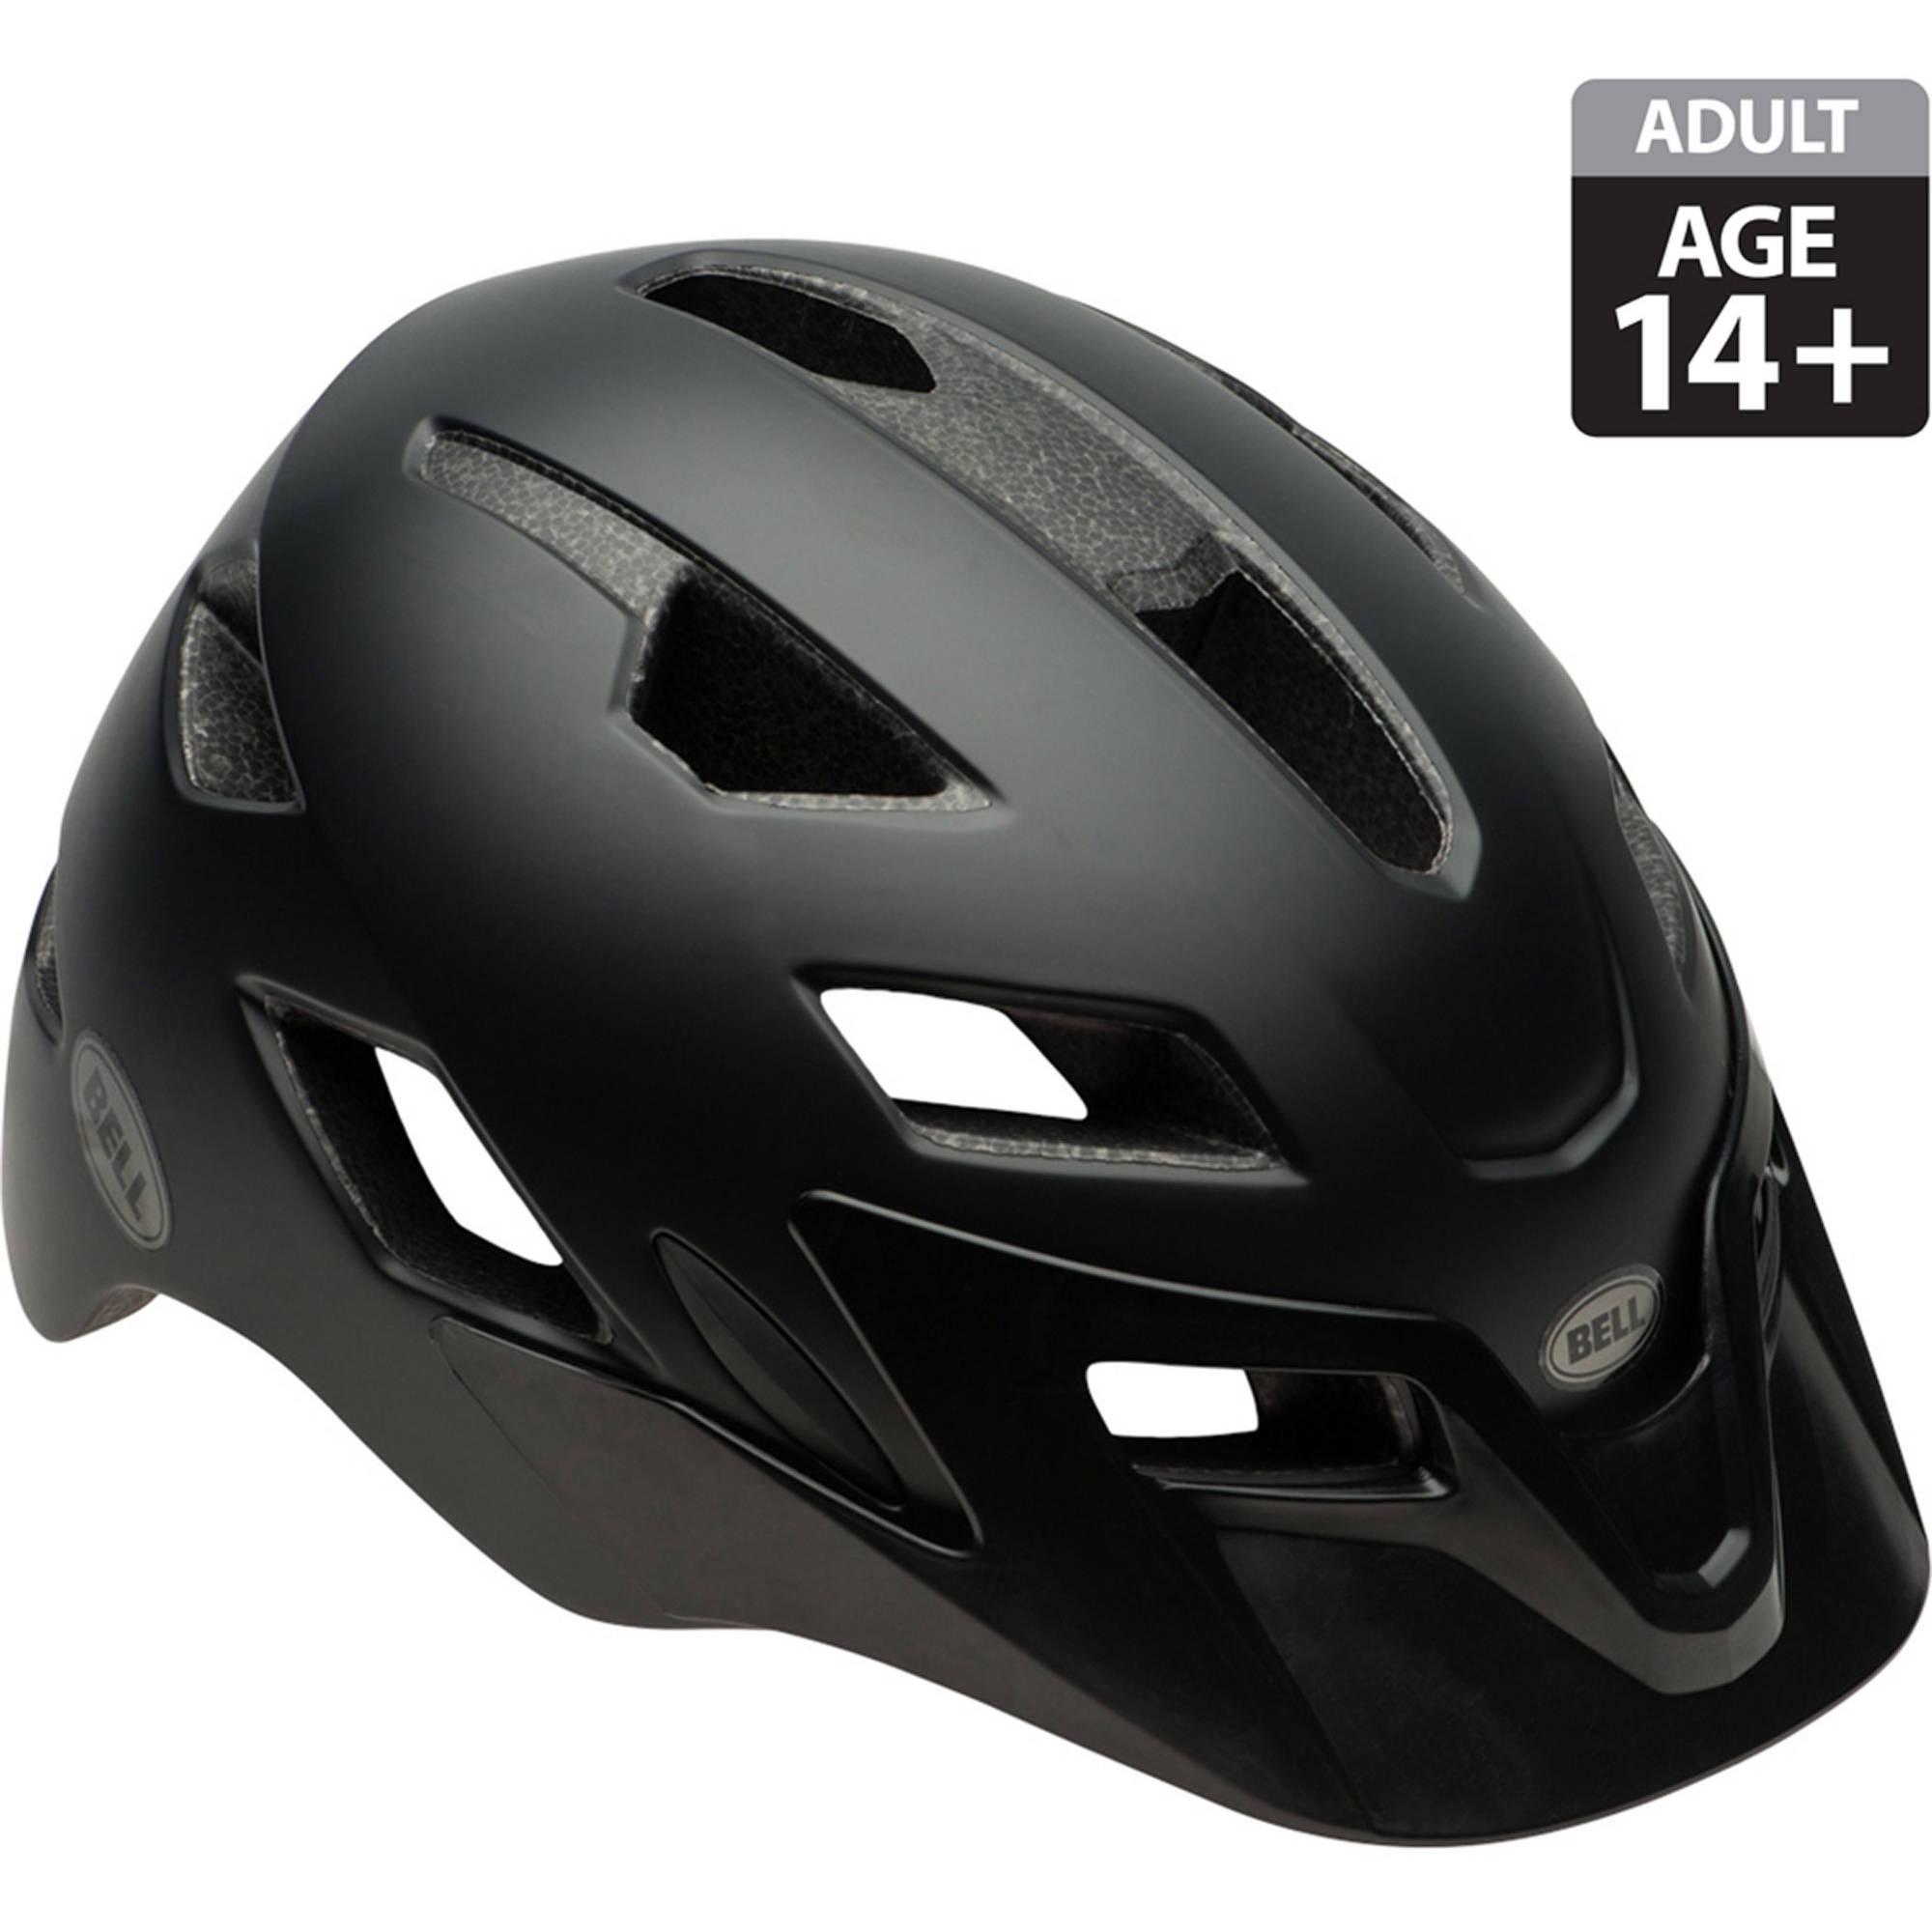 Bell Sports Terrain Adult Bike Helmet, Black